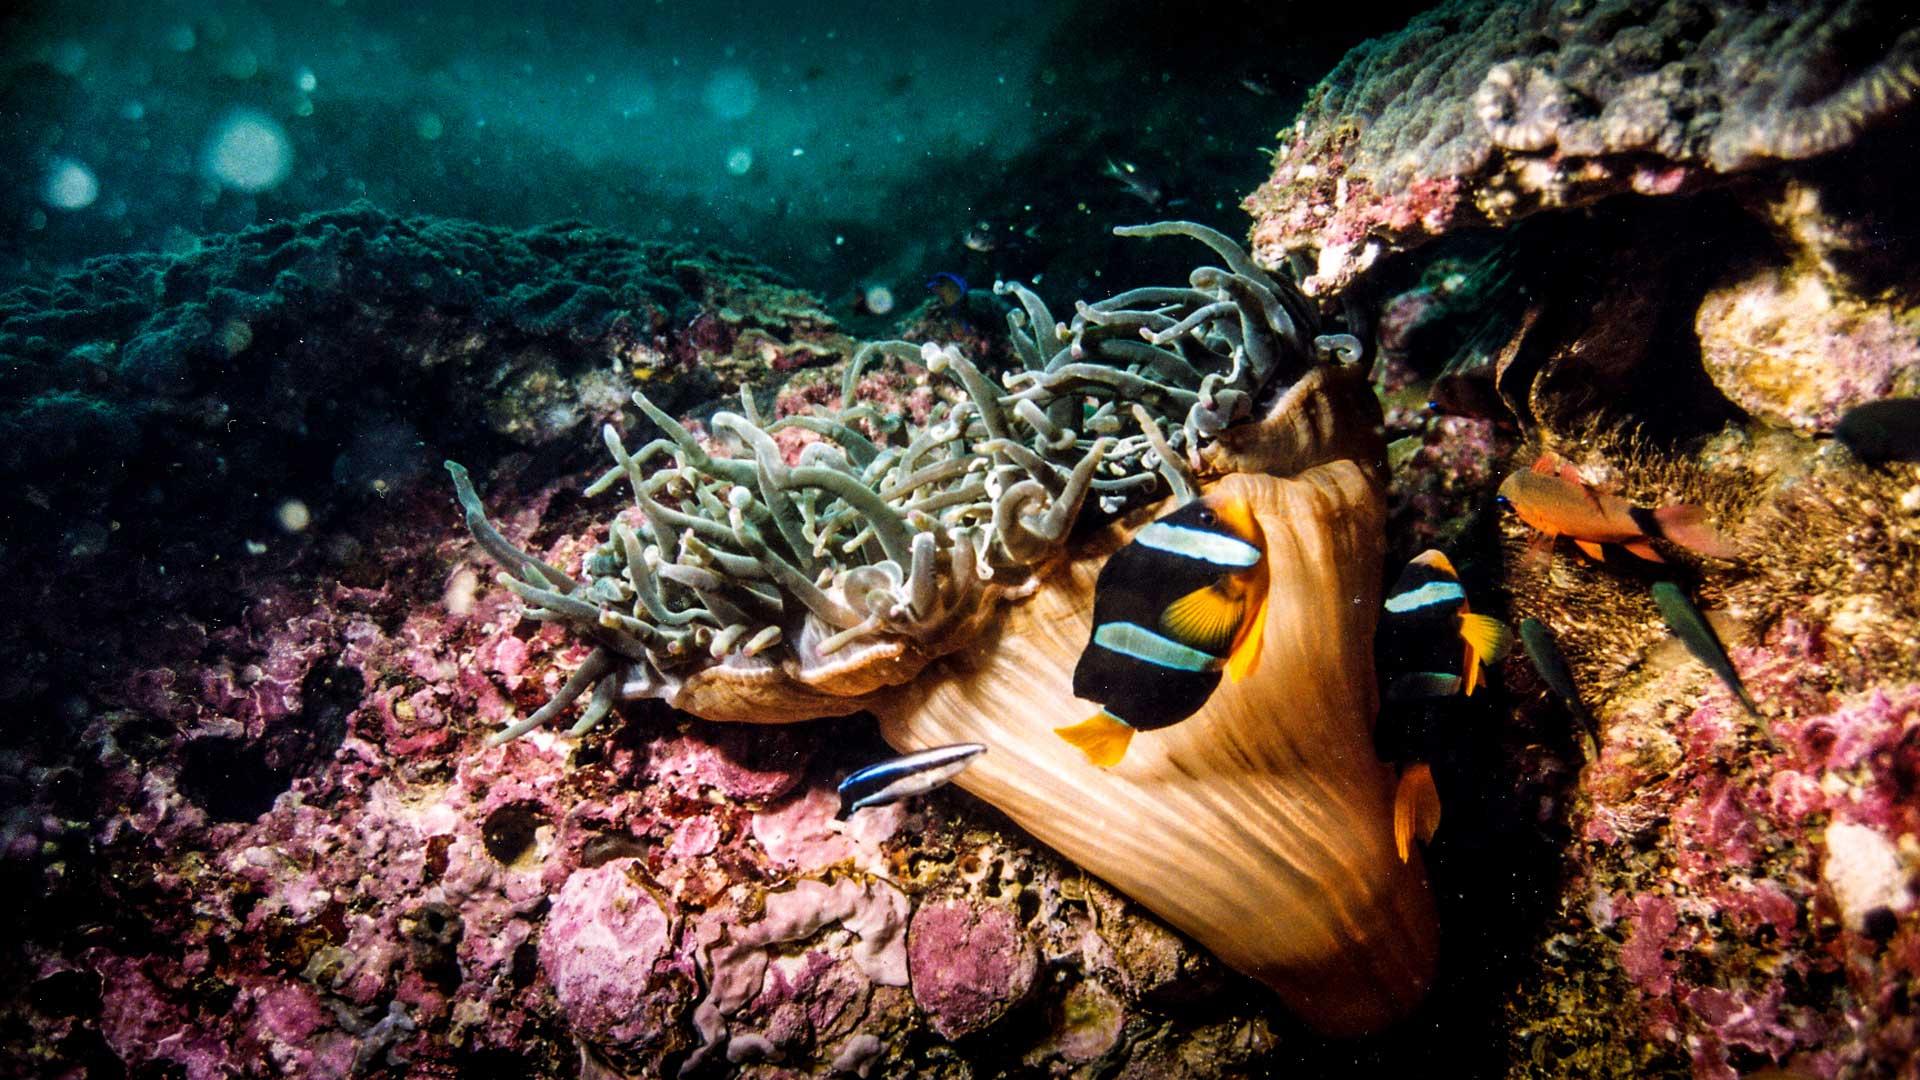 Brilliant and abundantly coloured coral garden